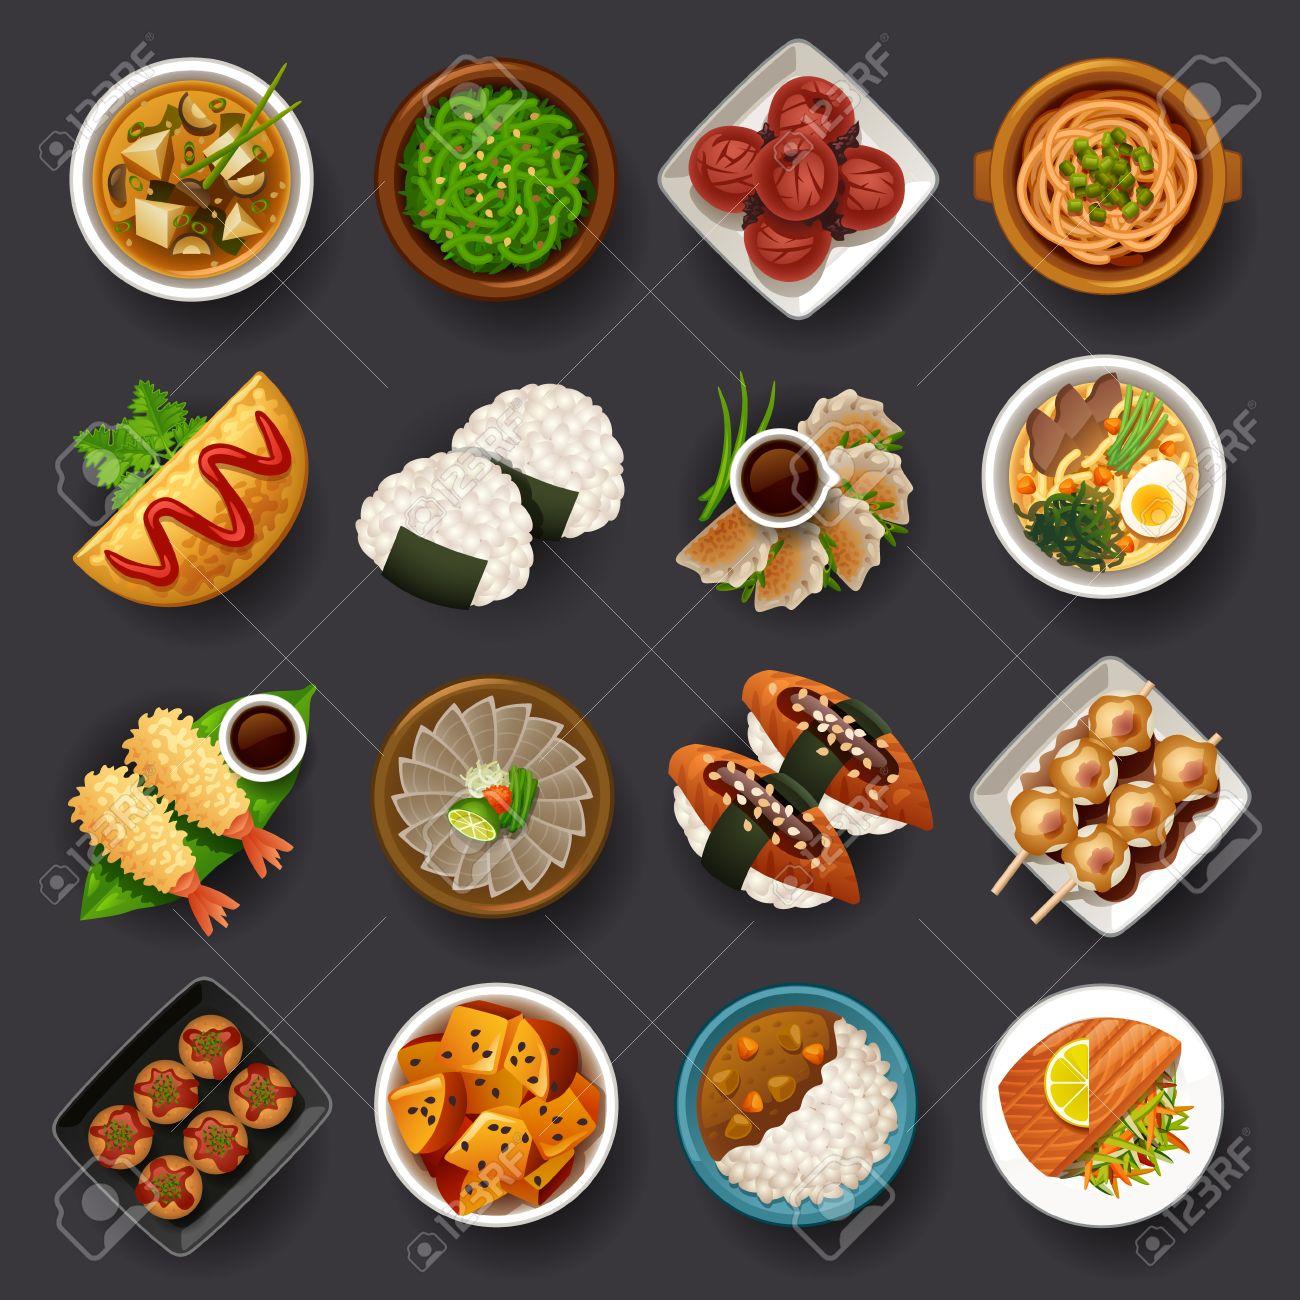 Japanese food icon set - 64941649